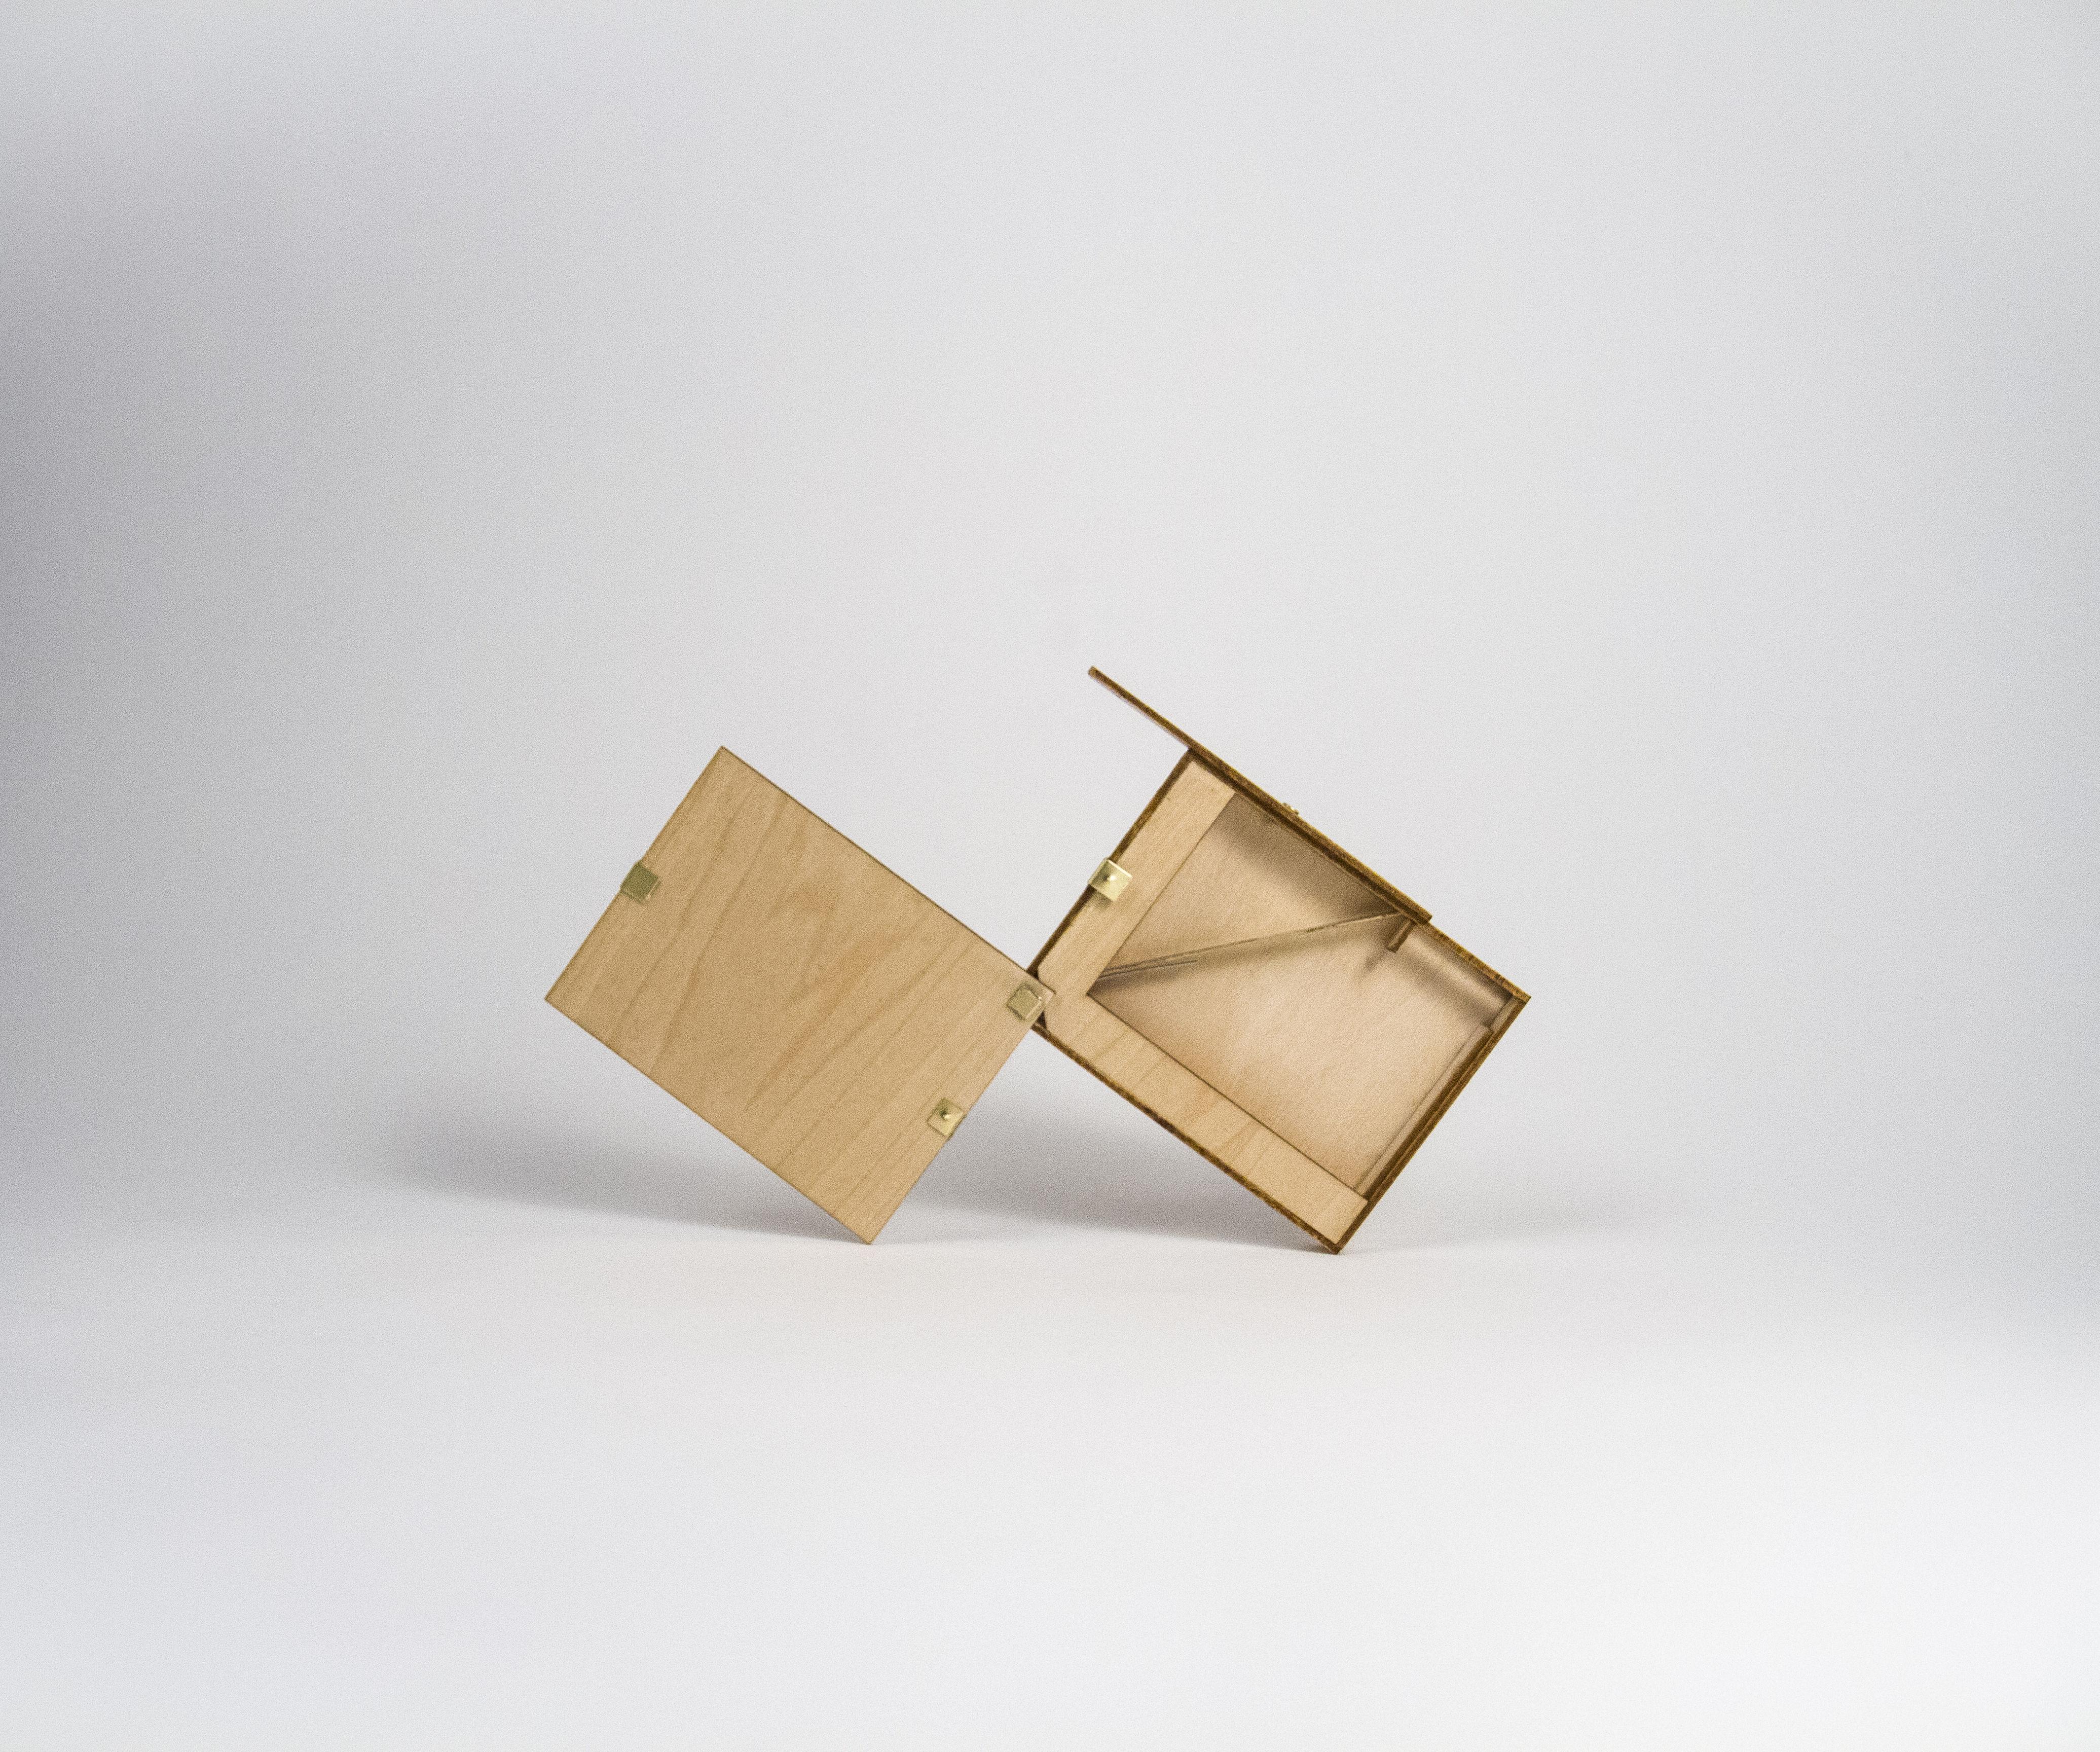 SmokeBox, Handmade Wooden Cigarette Case by lanceverde